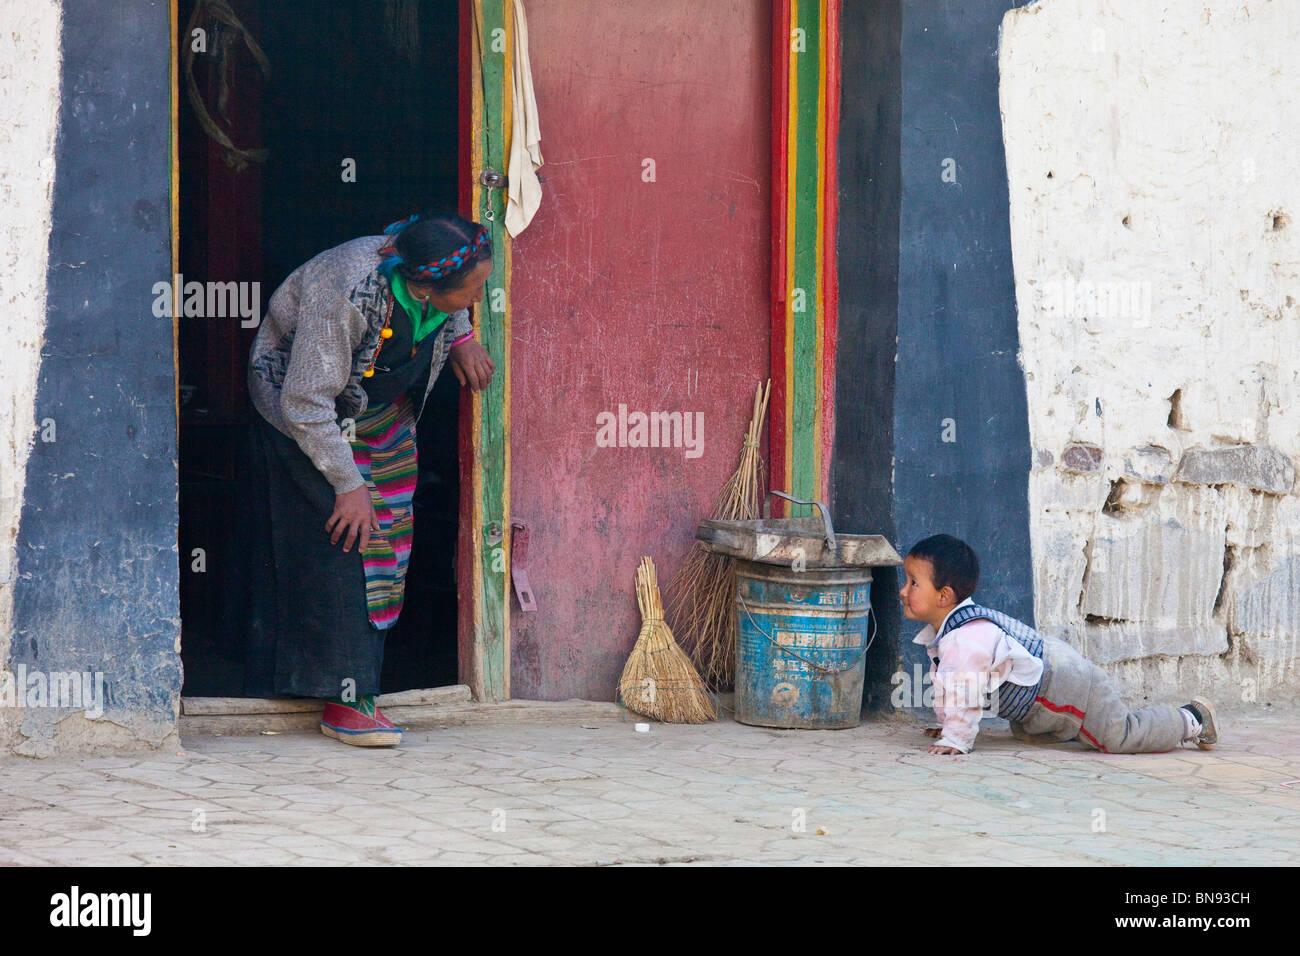 Grandmother and grandson in Gyantse, Tibet - Stock Image